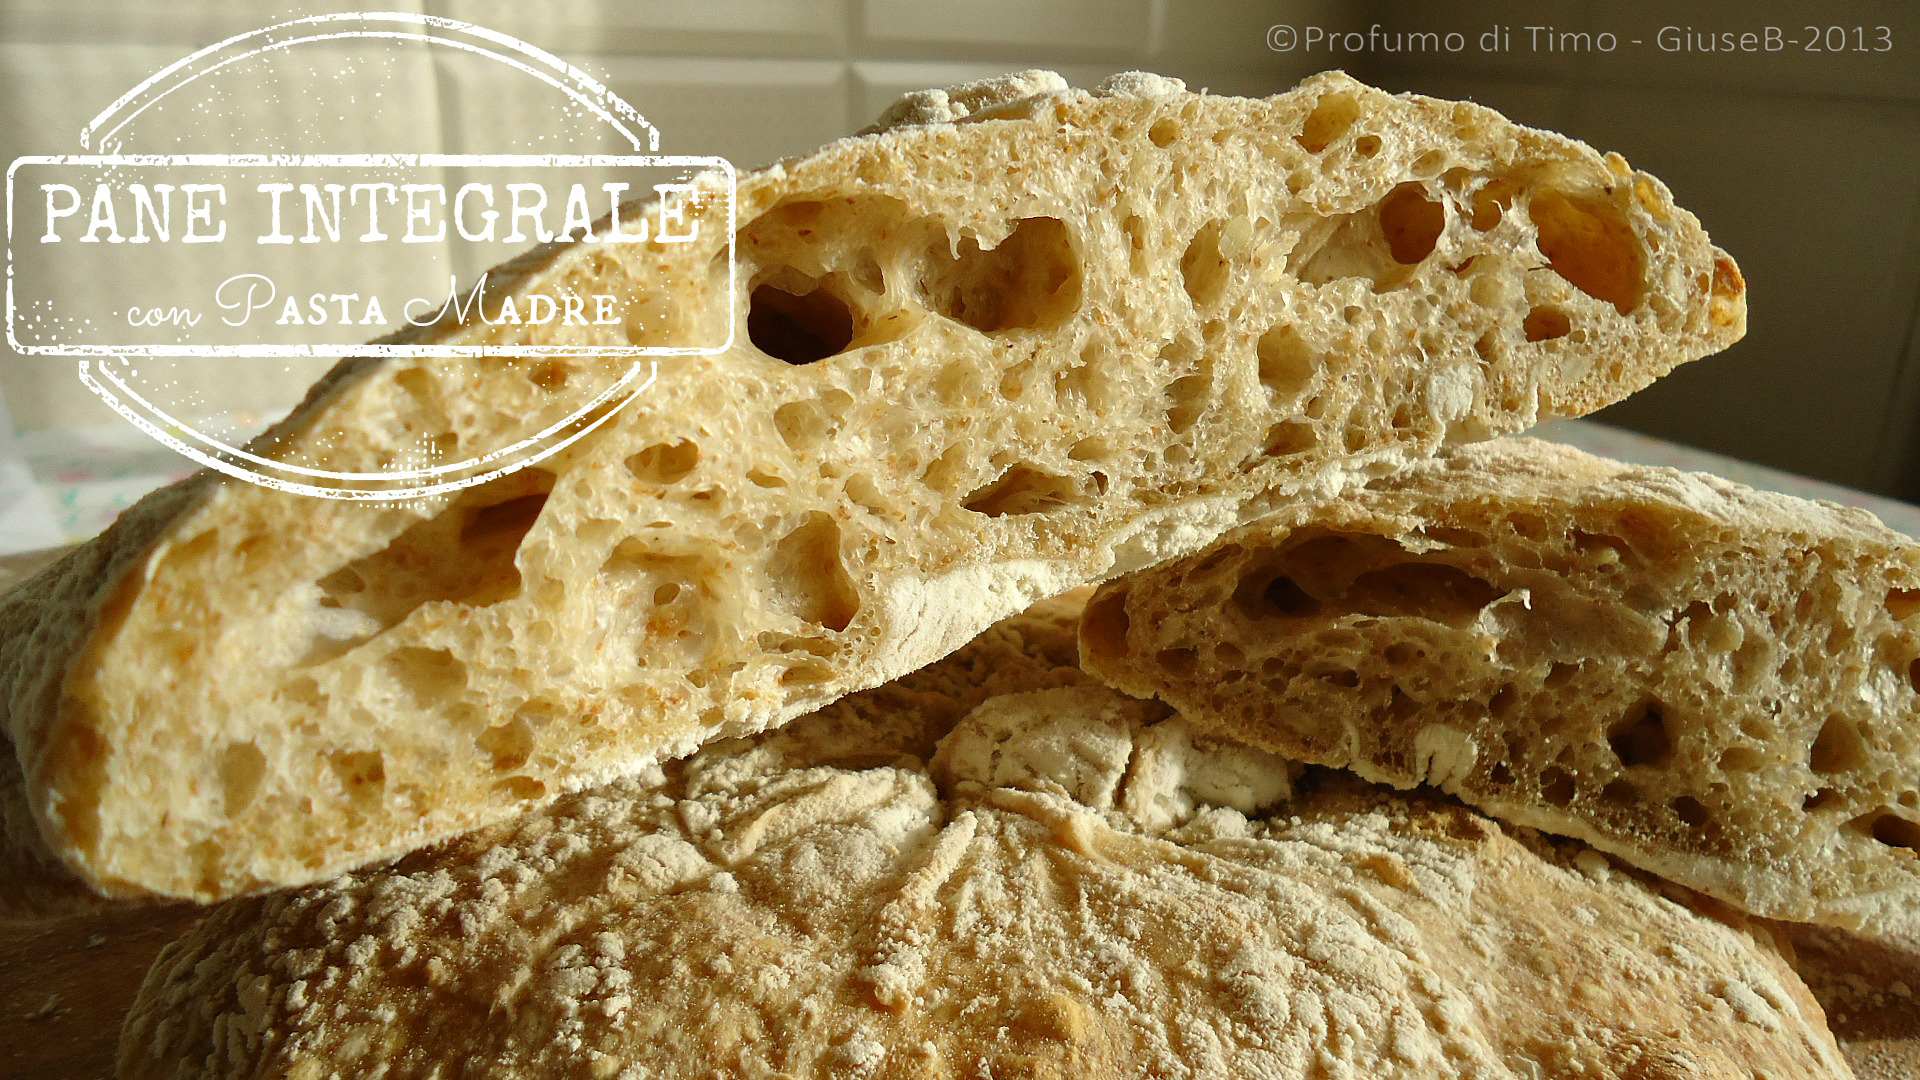 pane integrale alveolatissimo